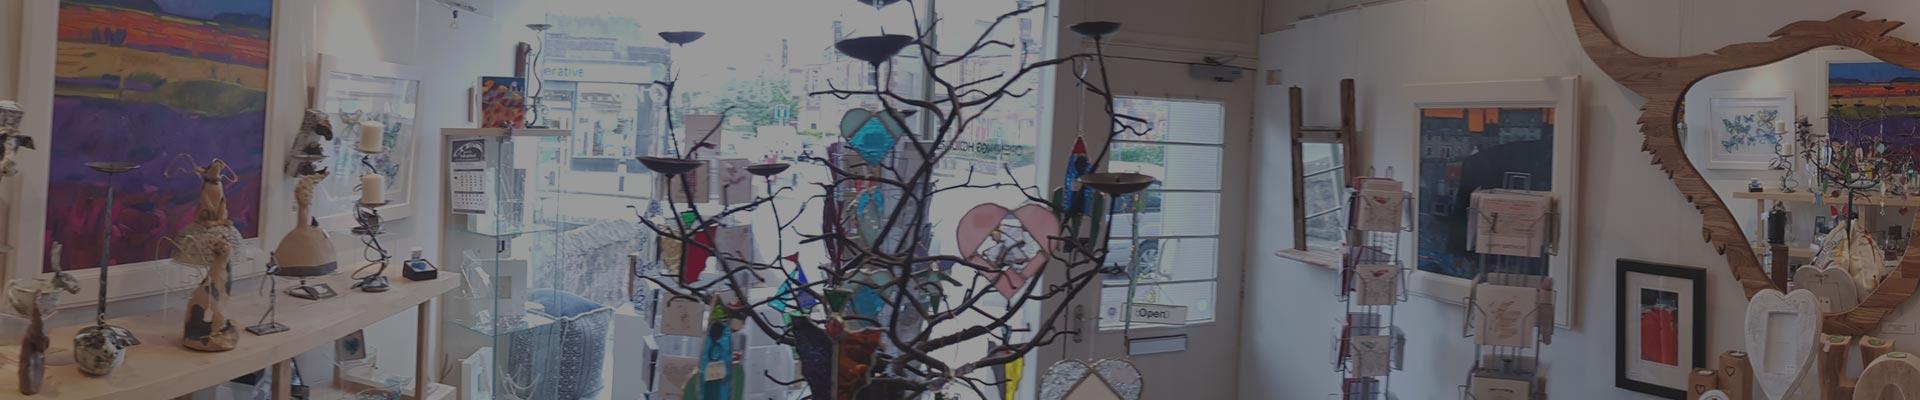 Art Room 59 Gift Shop